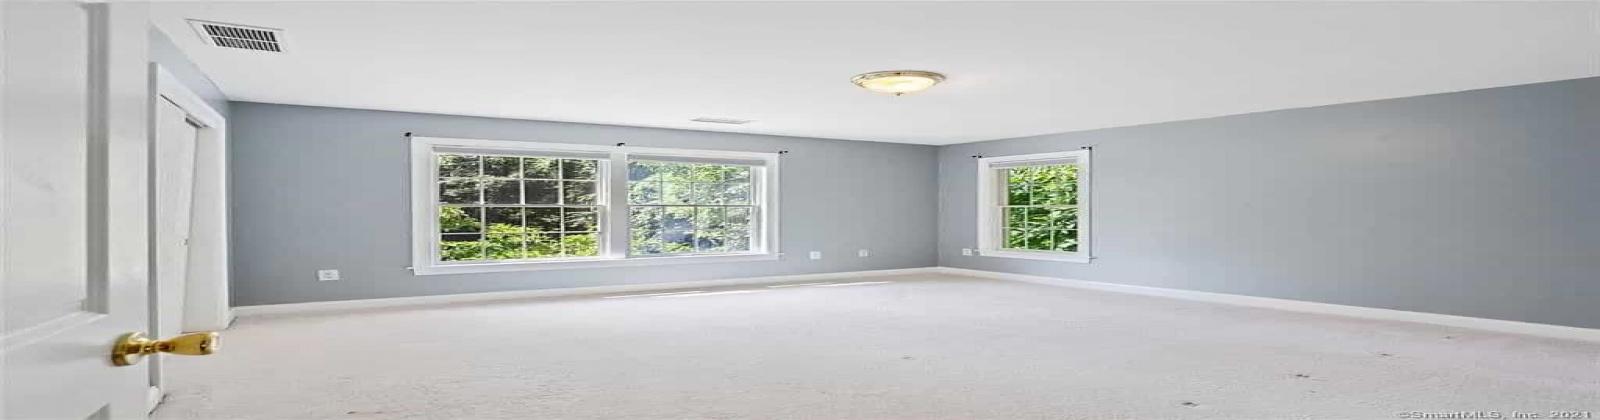 21 Rose Ln, East Lyme, Connecticut 06333, 4 Bedrooms Bedrooms, ,3 BathroomsBathrooms,Villa,For Sale,Rose Ln,1046